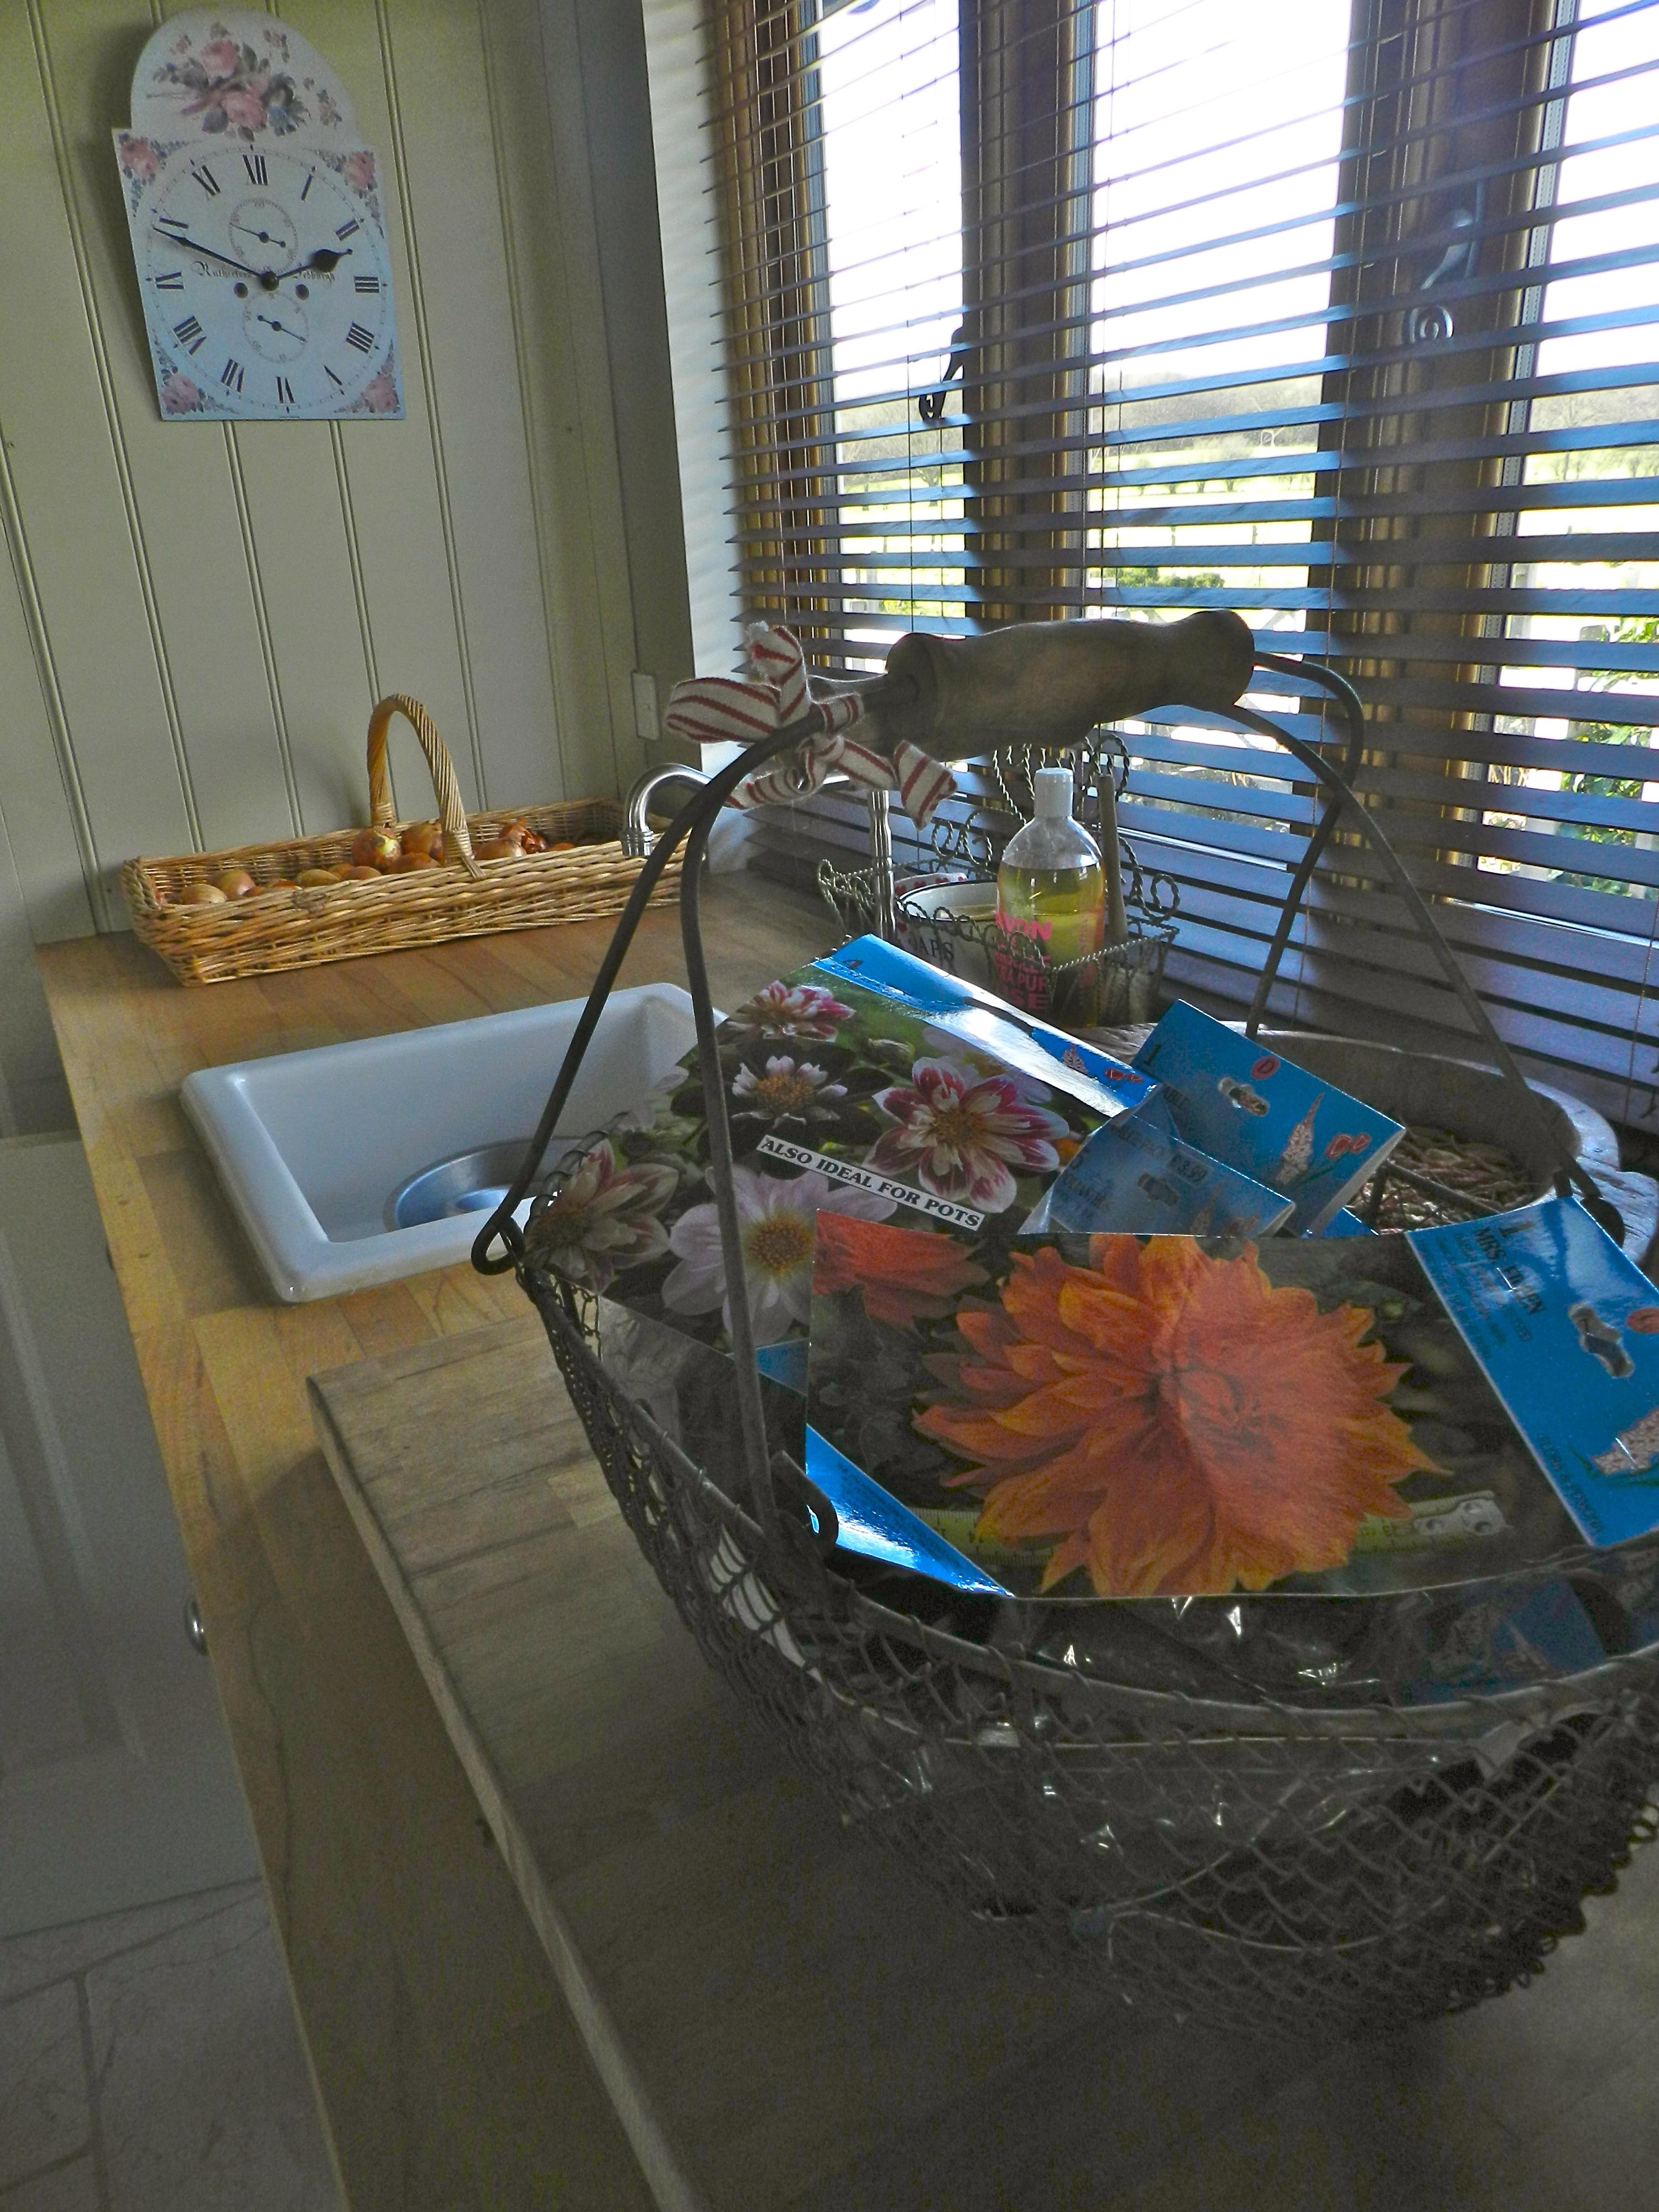 Basket of dahlia tubers